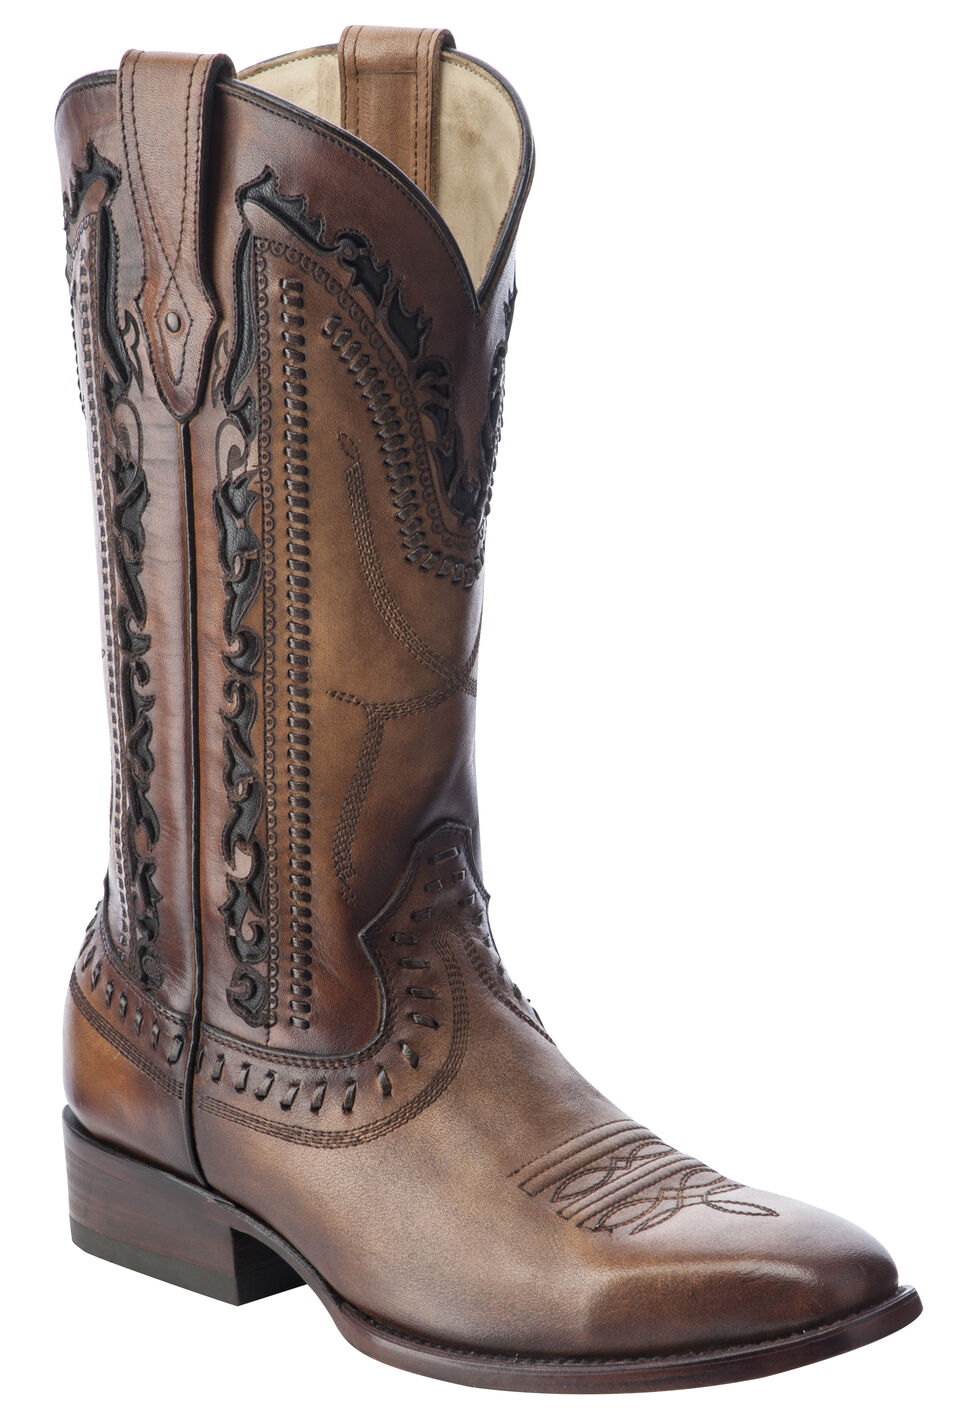 Corral Laser Cut Whip-Stitch Cowboy Boots - Square Toe, Tan, hi-res